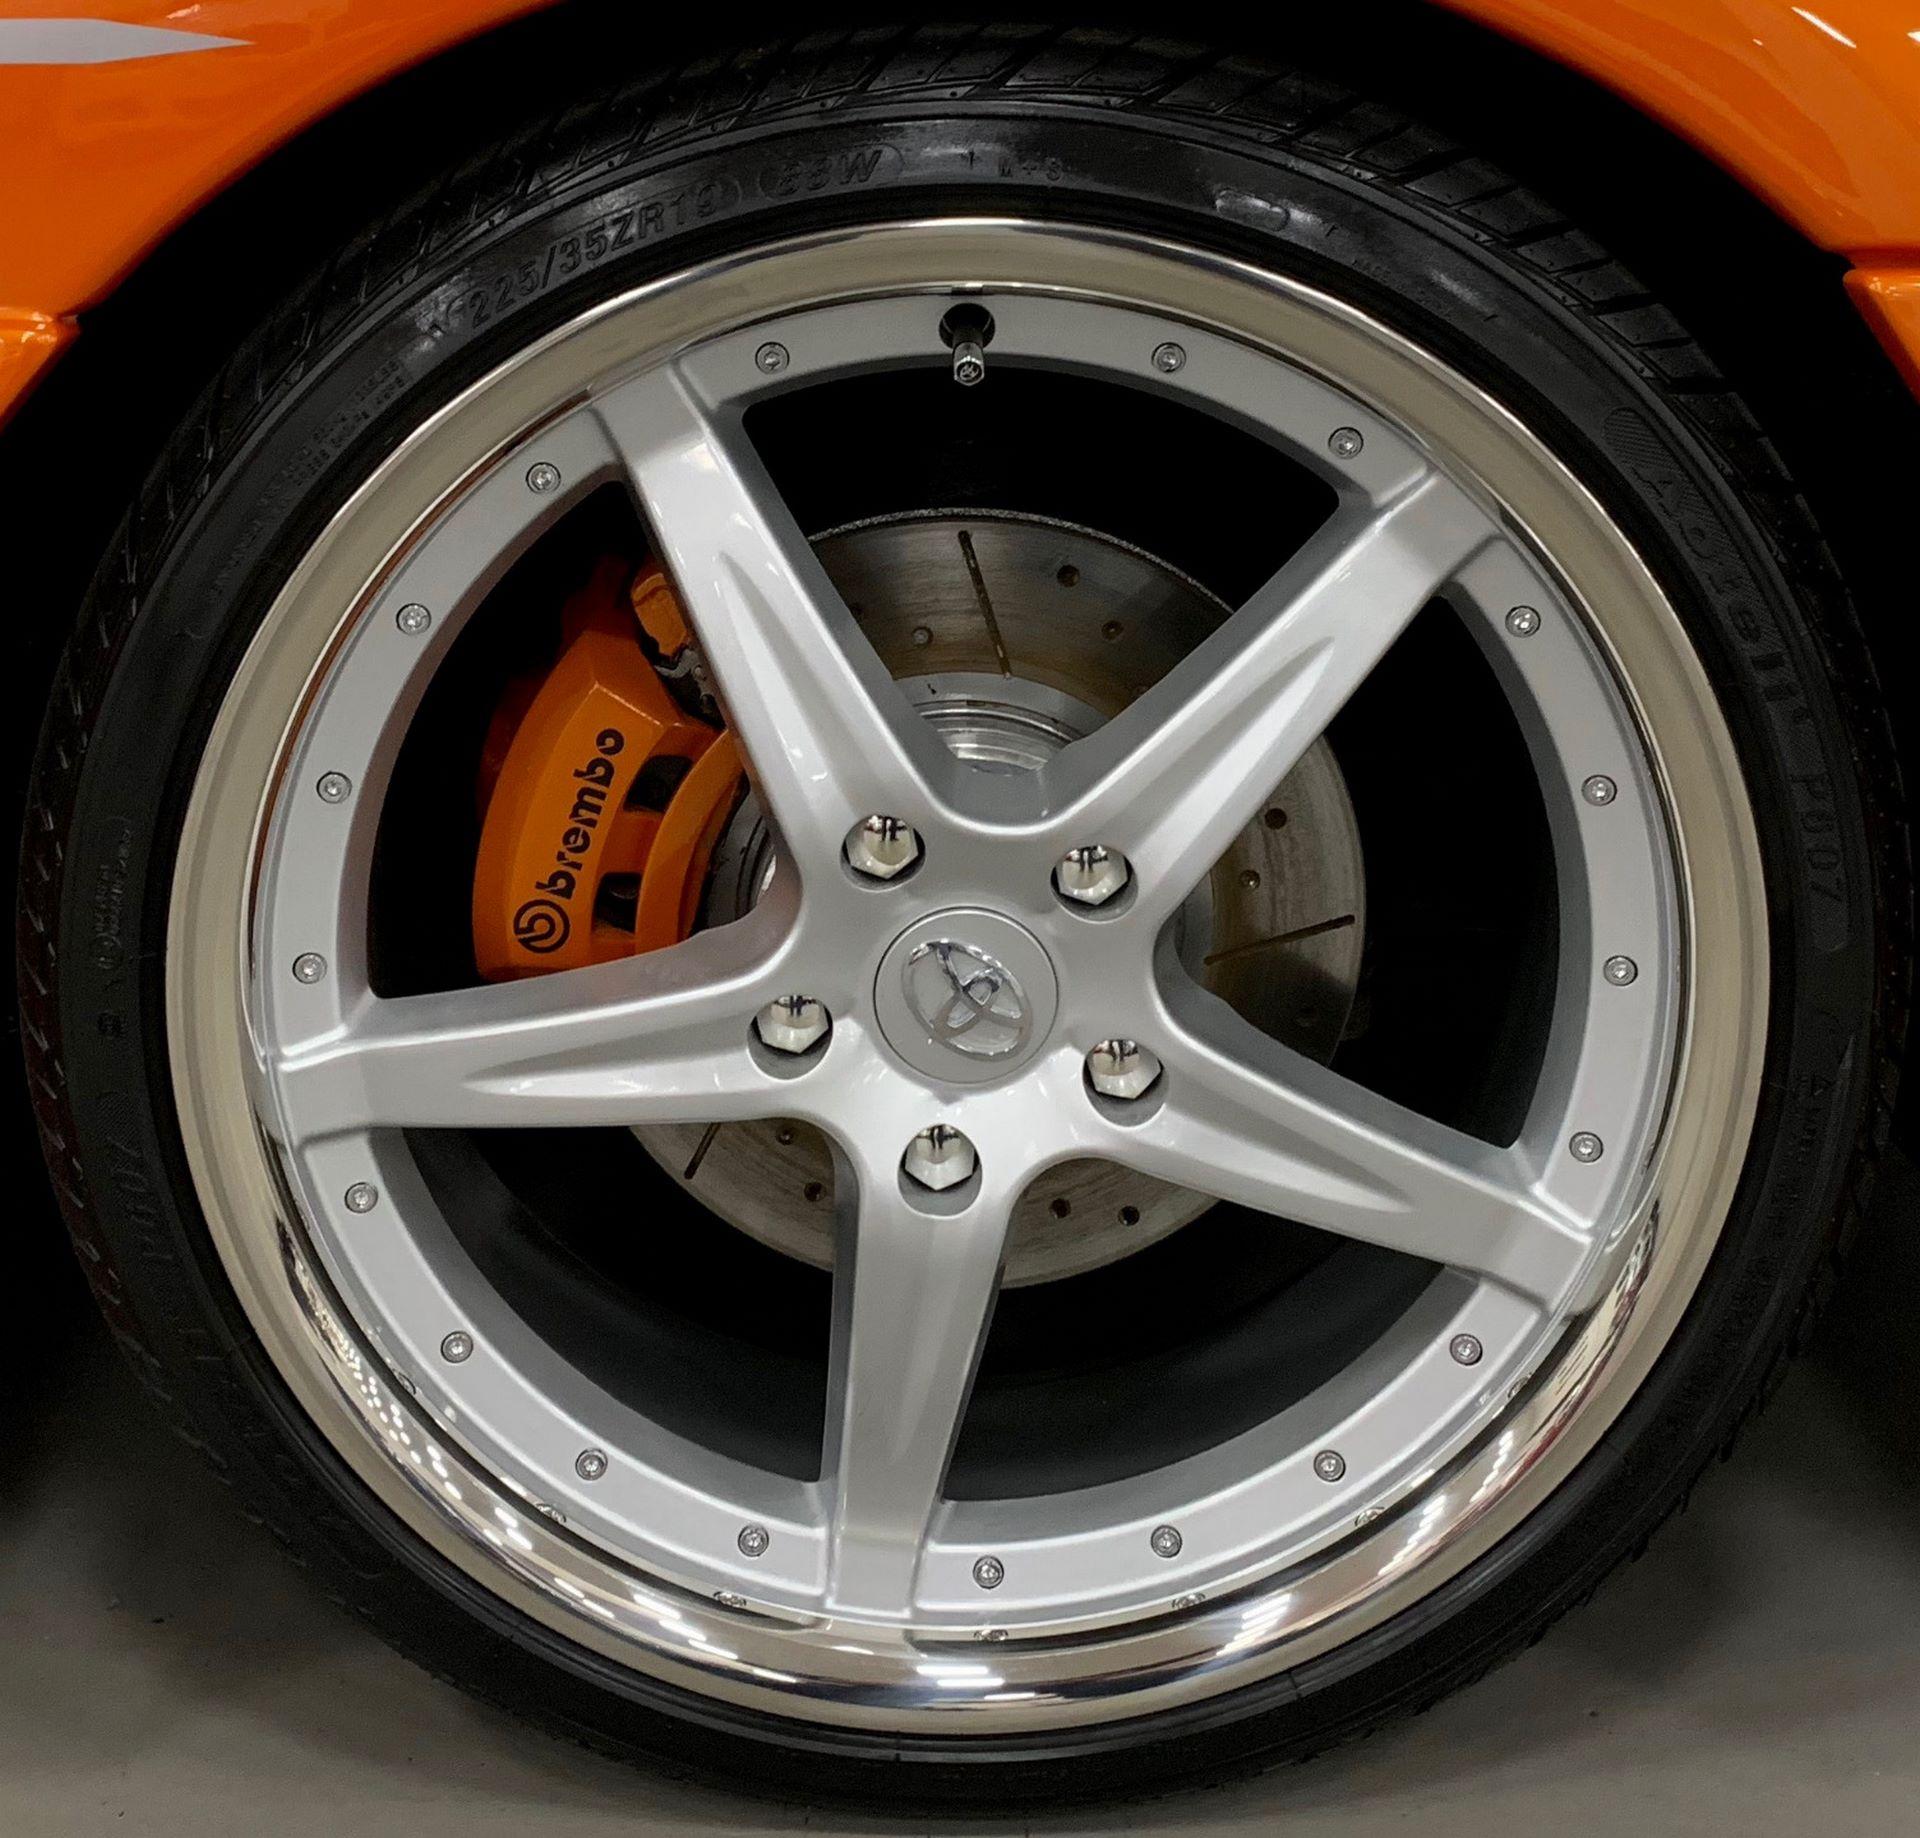 Toyota-Supra-replica-the-fast-and-the-furious-23